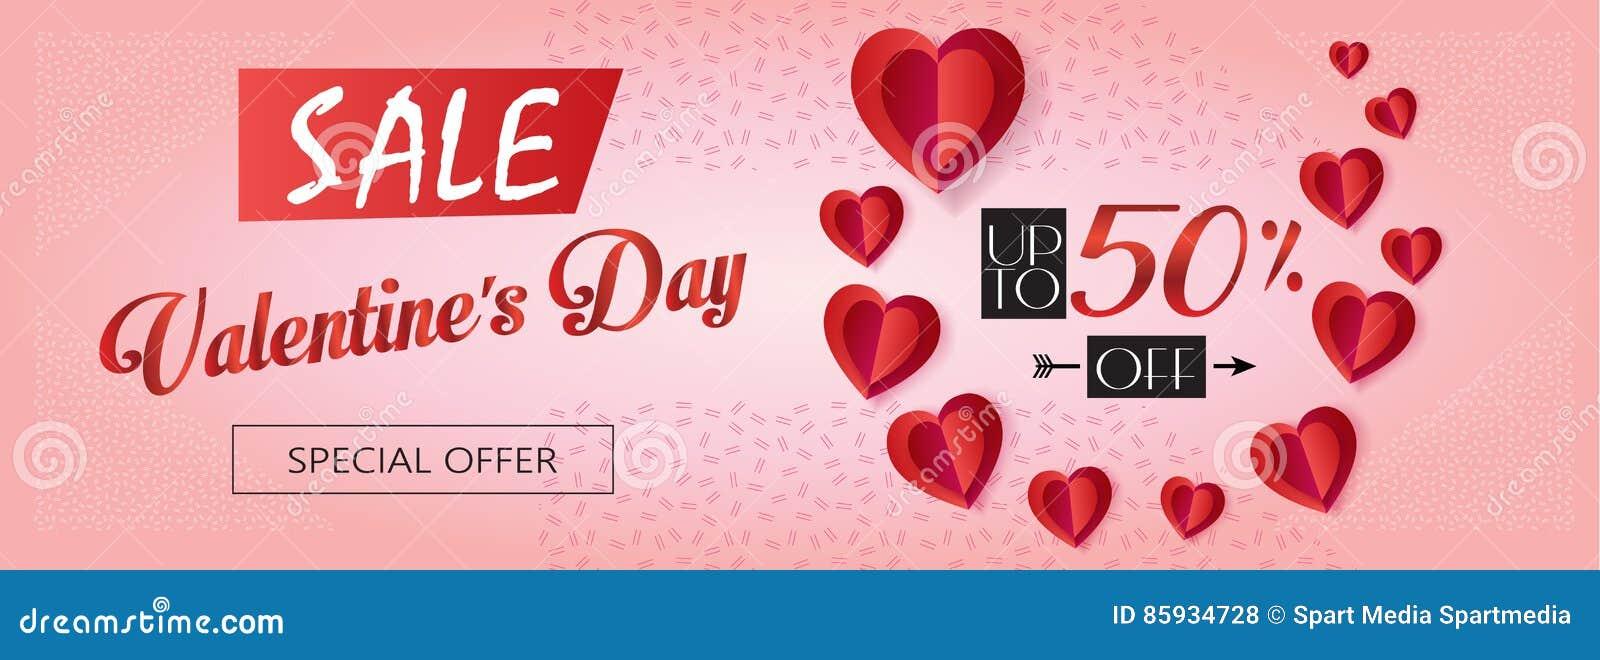 Valentines Day Sale 2019 Stock Vector Illustration Of Design 85934728